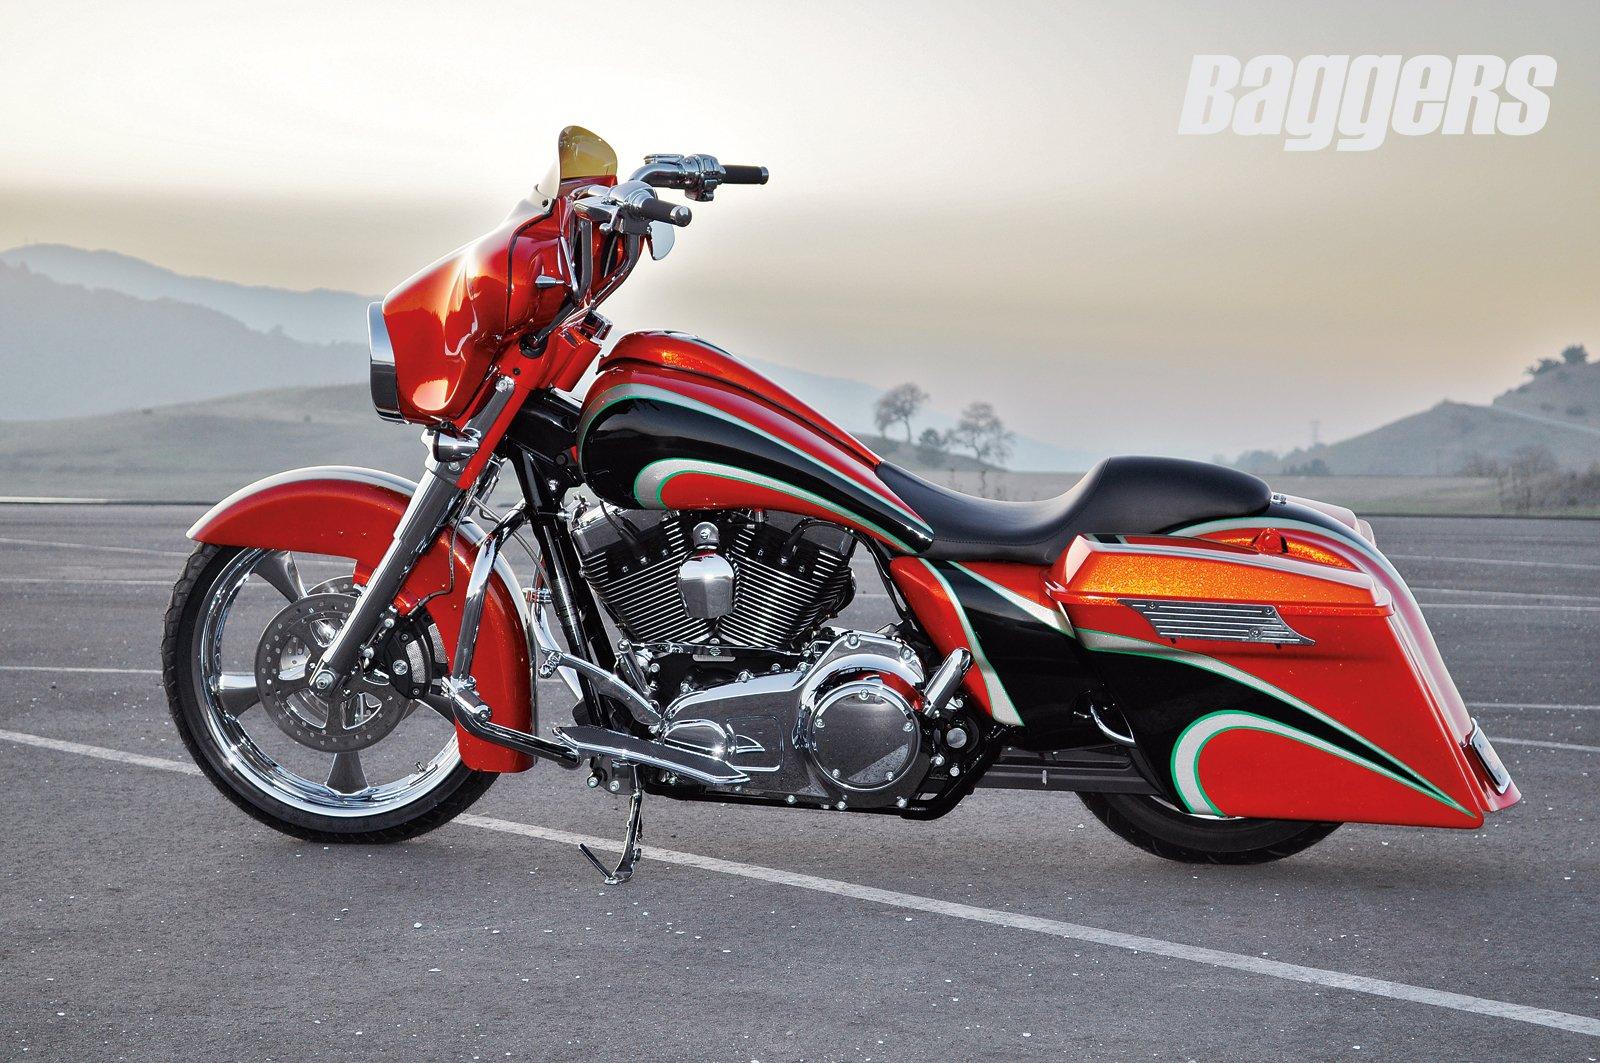 motorcycle harley street glide wallpaper - photo #1